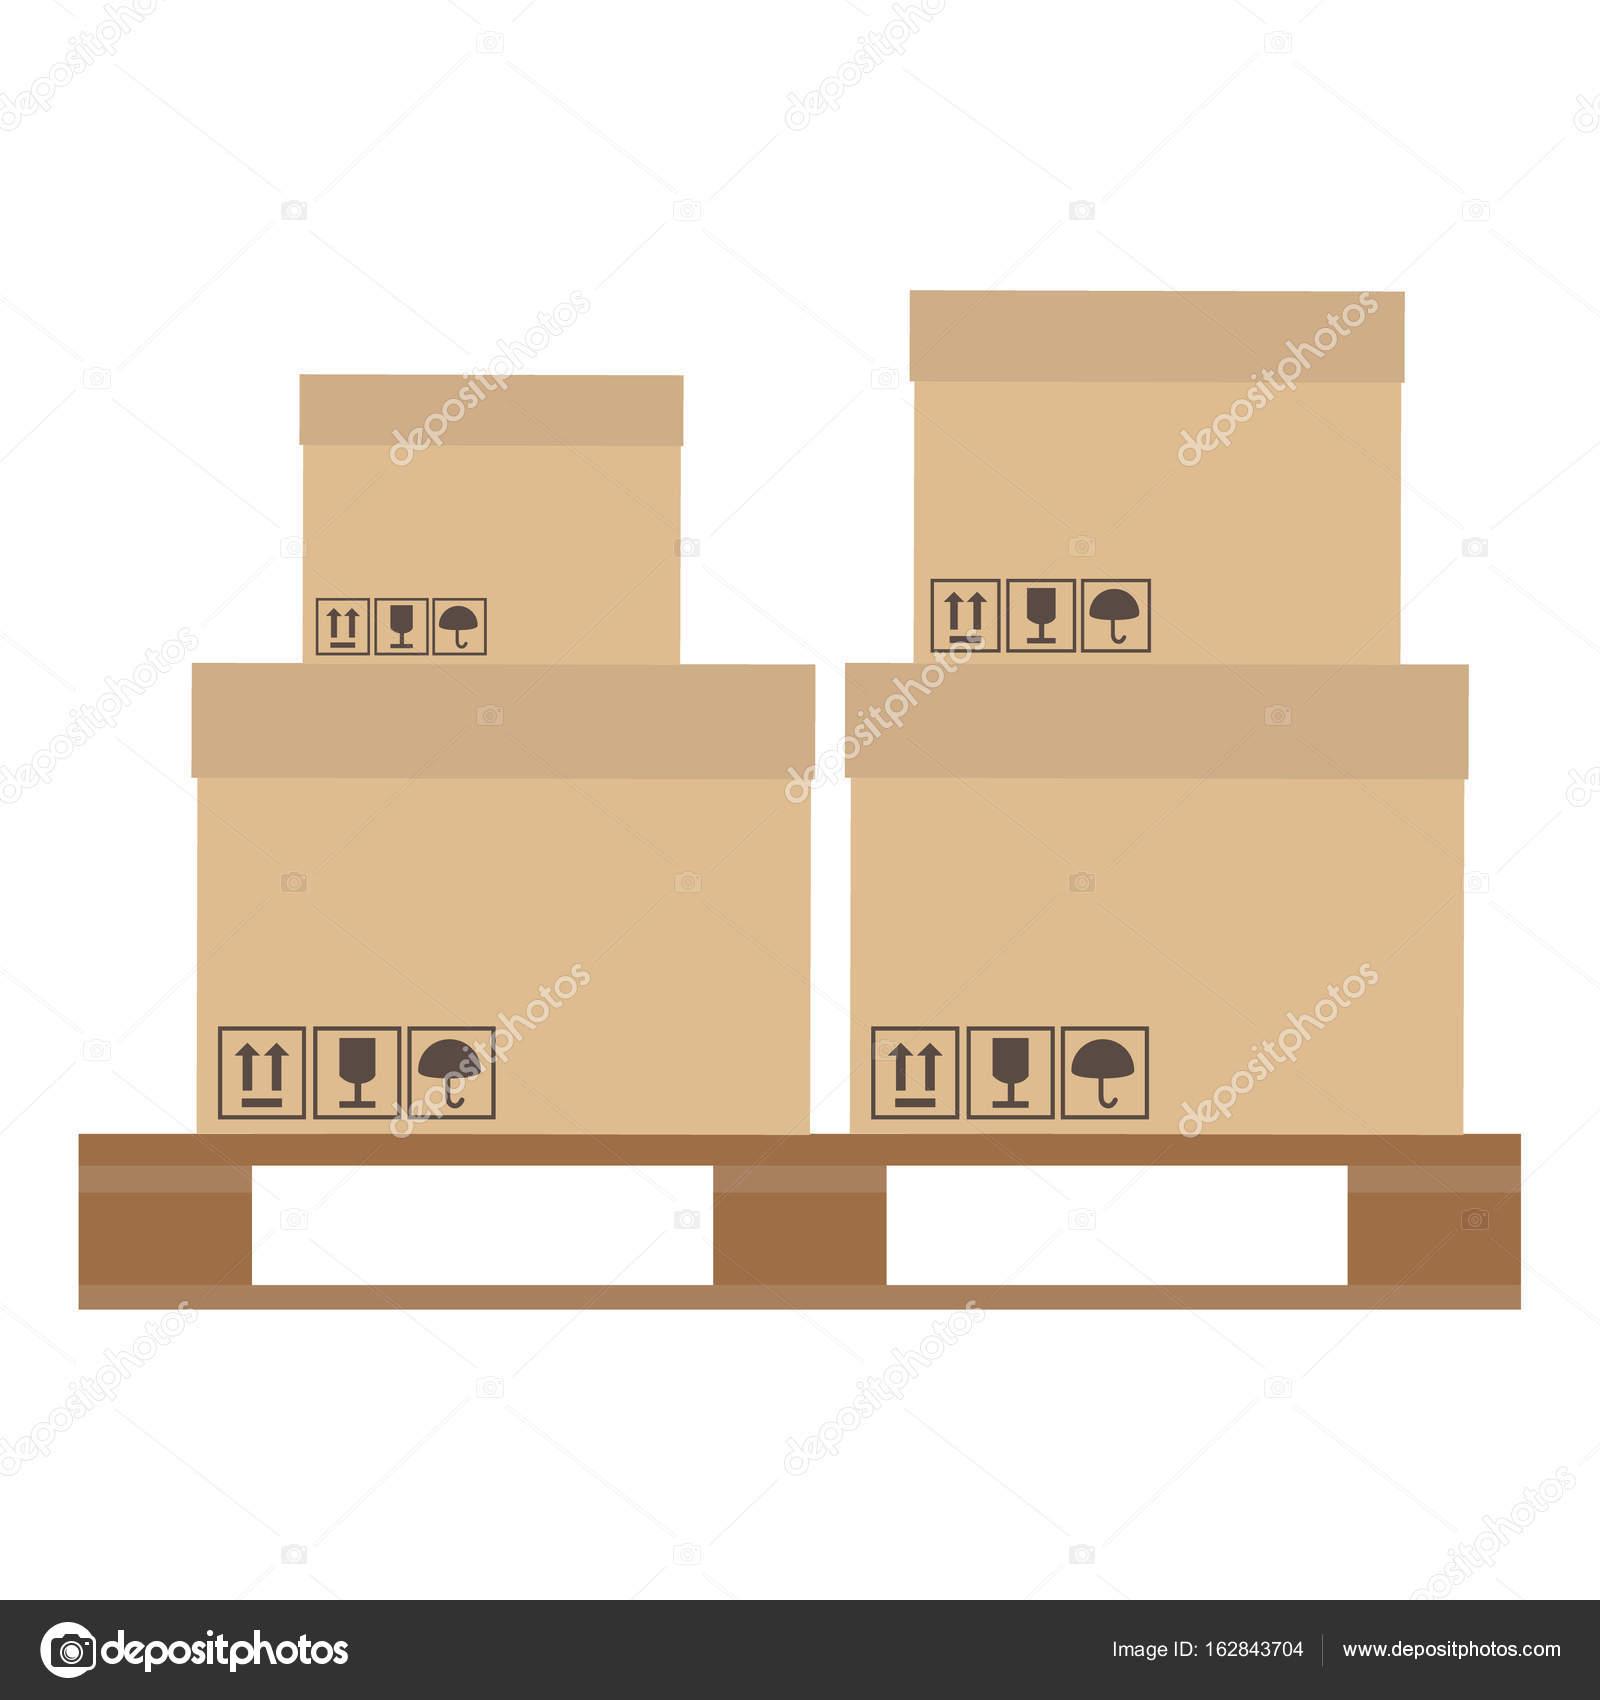 kartons auf palette berechnen euro norm standard karton hoffmann verpackung verpackungen. Black Bedroom Furniture Sets. Home Design Ideas